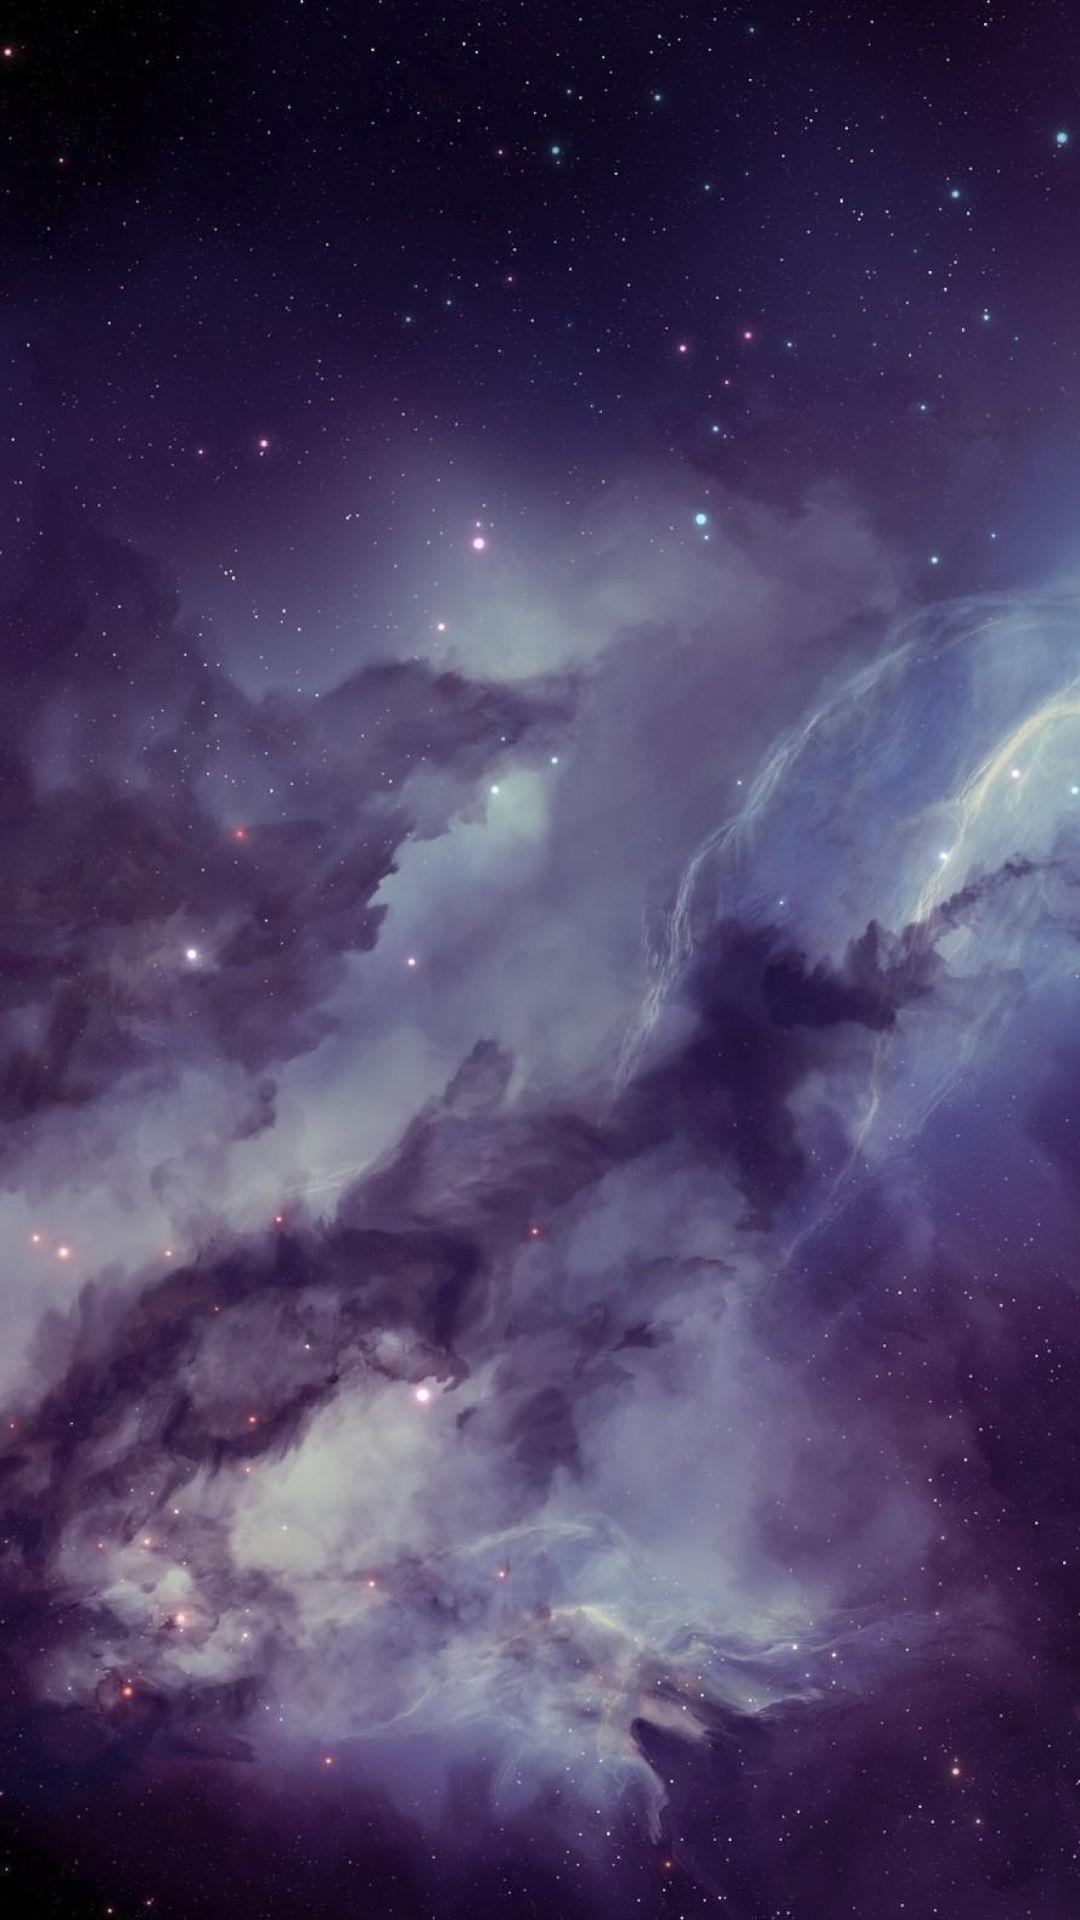 Pin by meggan sloas on mobile wallpapers galaxy - 1080p nebula wallpaper ...